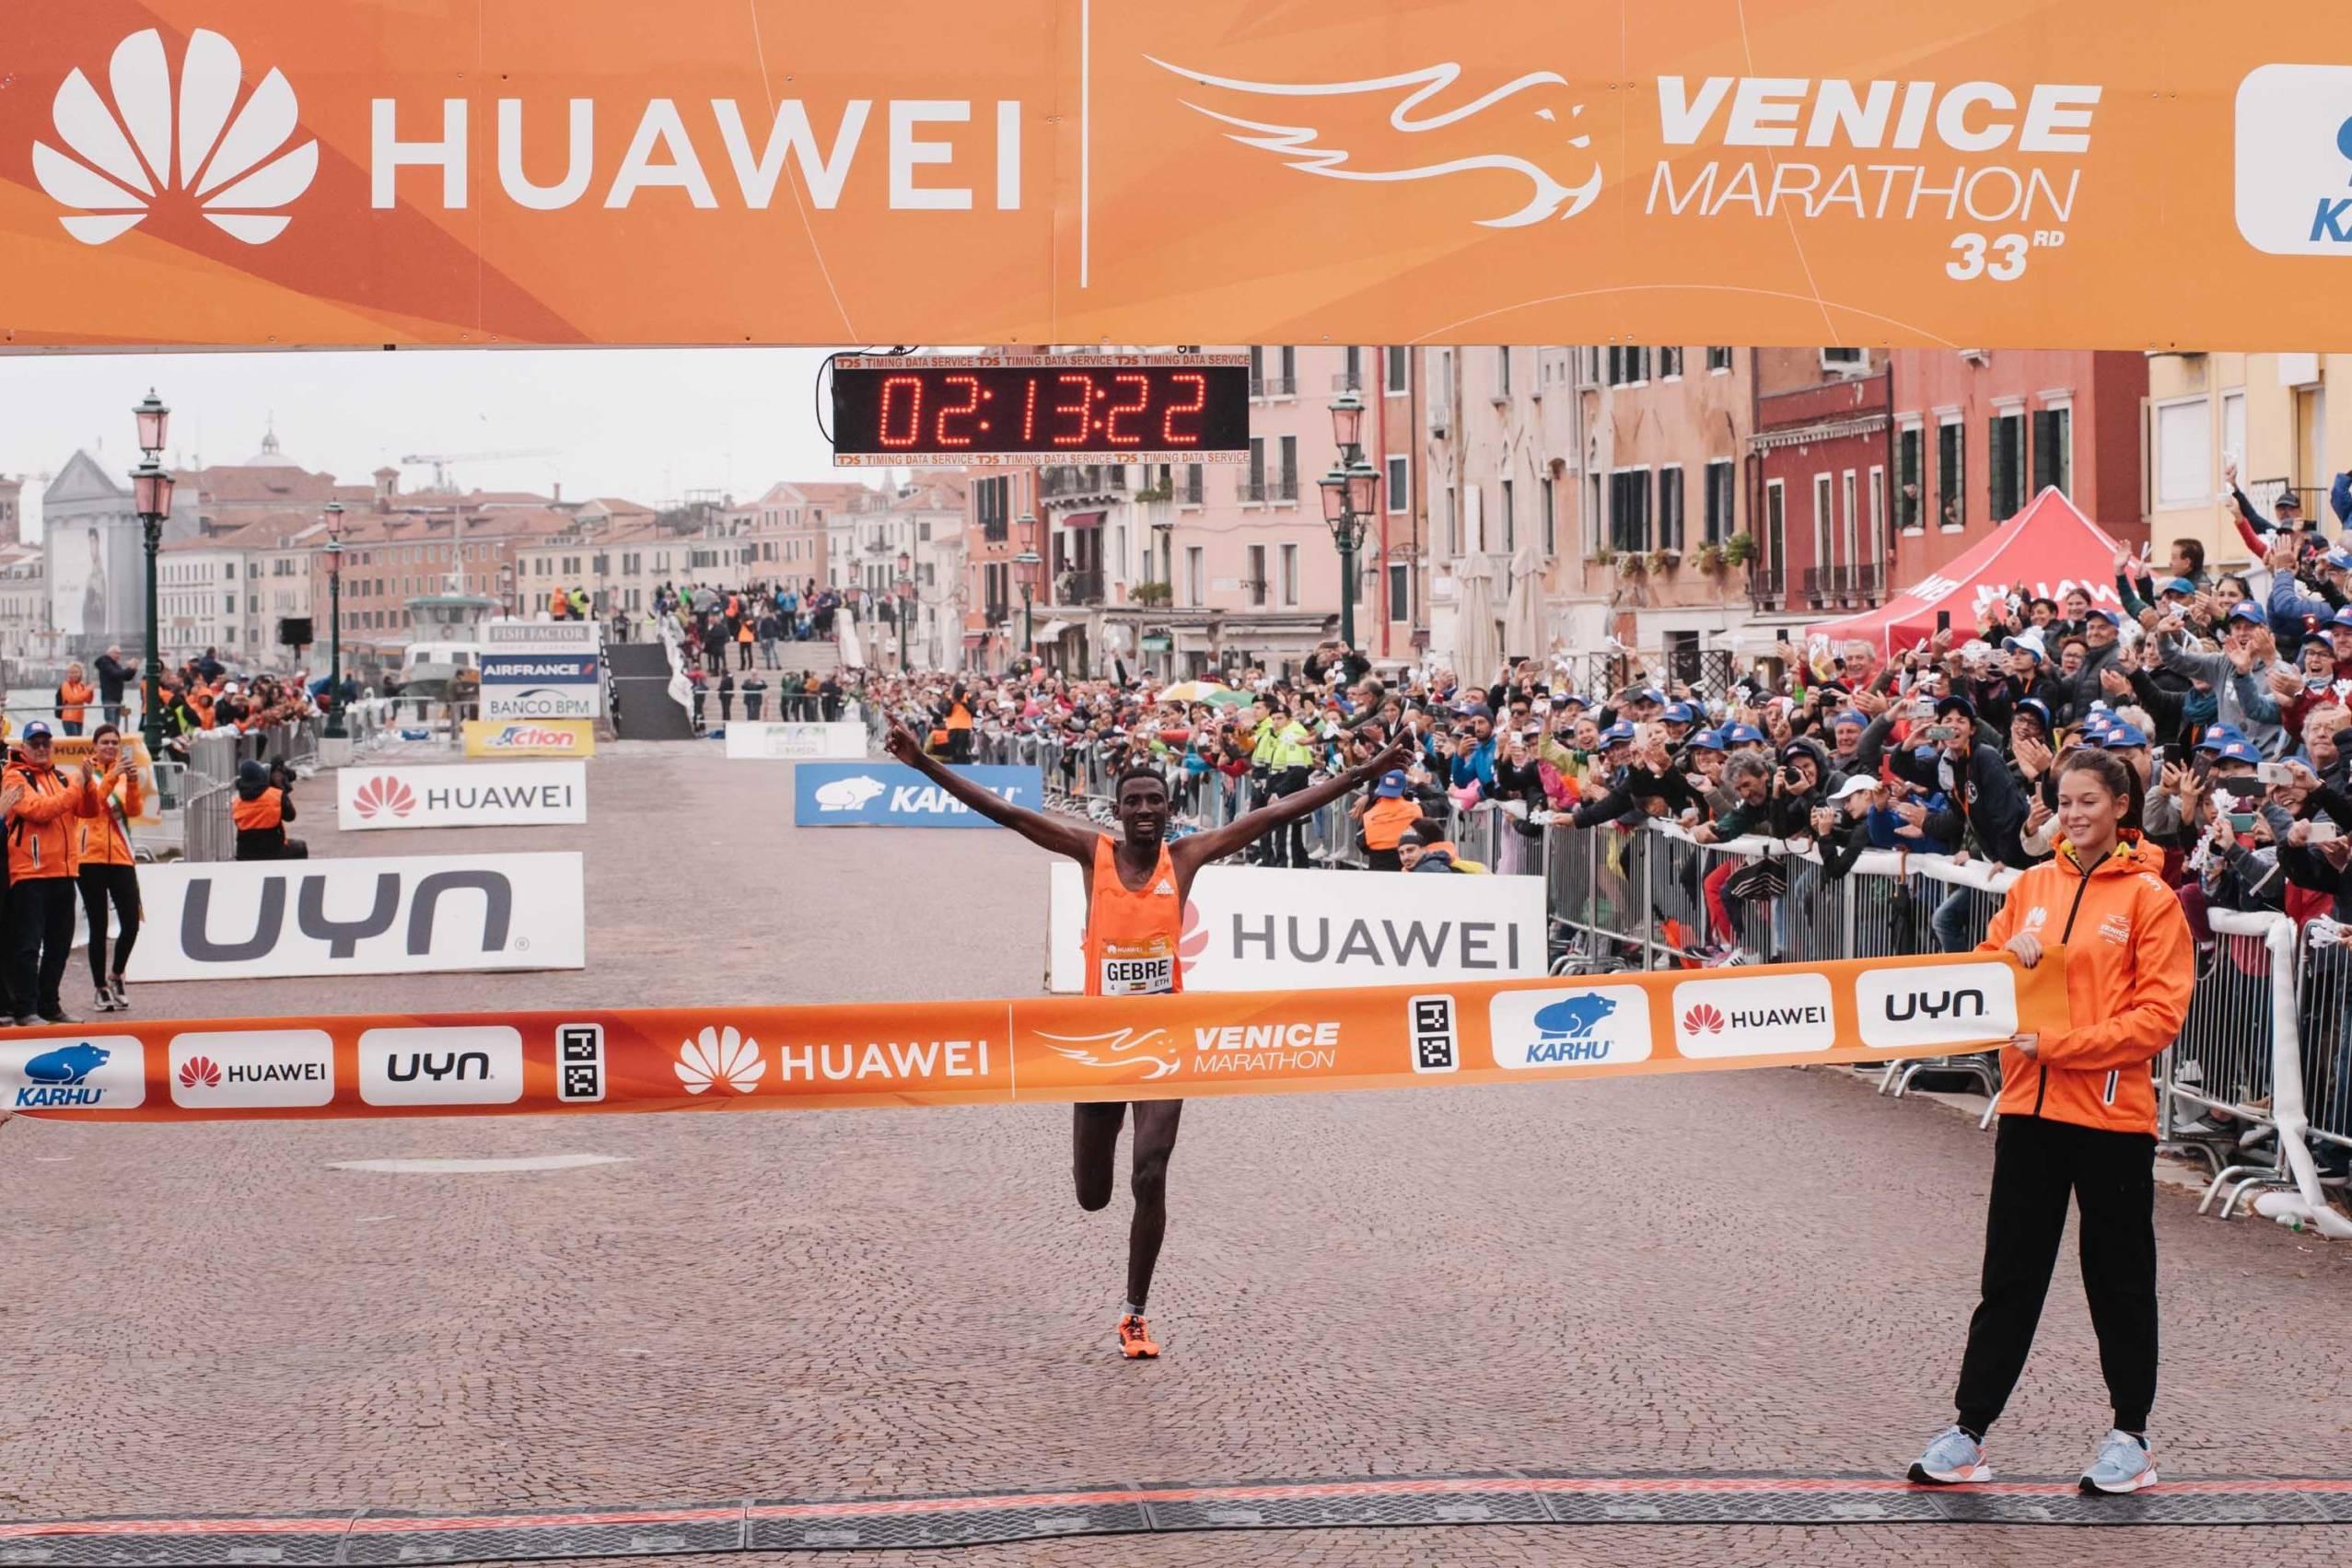 Huawei marathons event